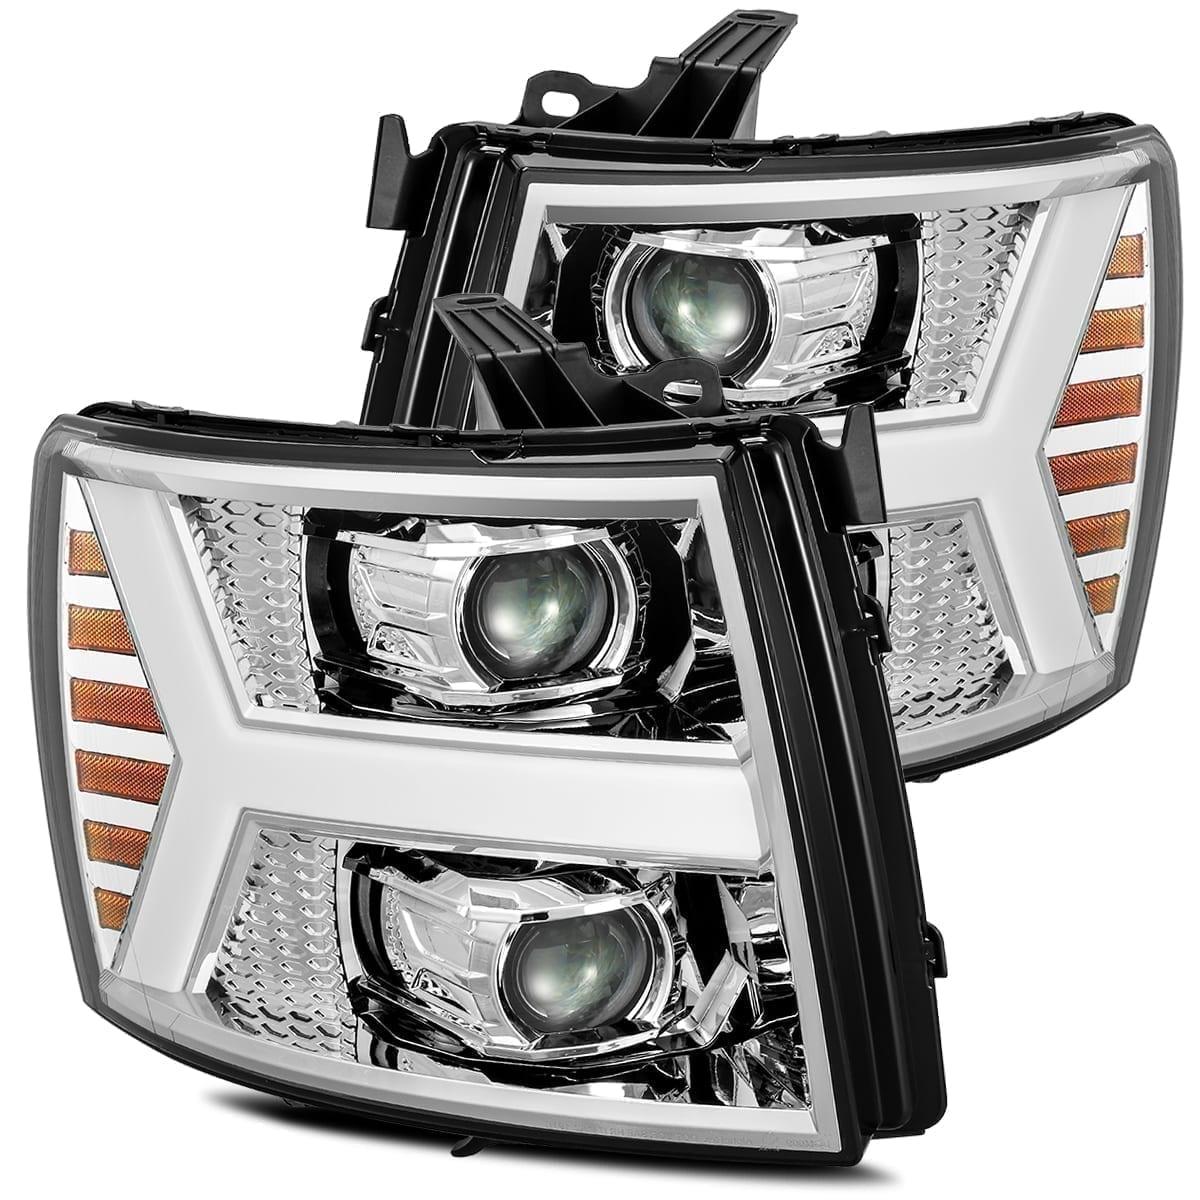 AlphaRex 2007 2008 2009 2010 2011 2012 2013 Chevrolet Silverado 1500/2500HD/3500HD PRO-Series Projector Headlights Chrome